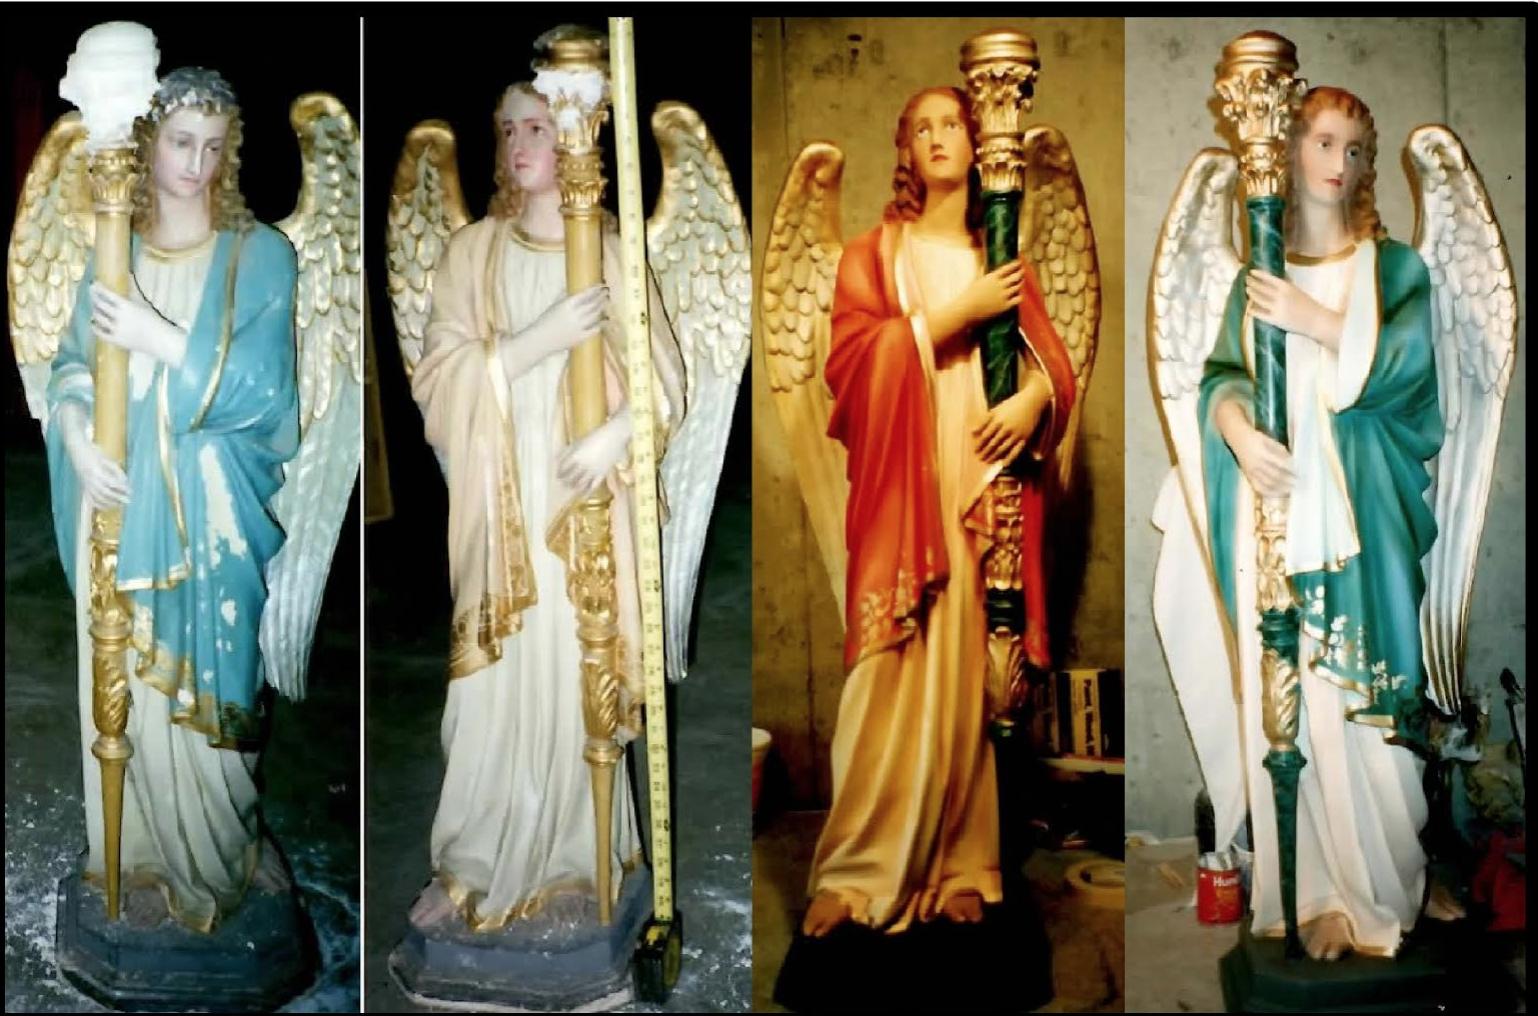 Season 4, The Catholic Home, Episode 1: Home Altars And